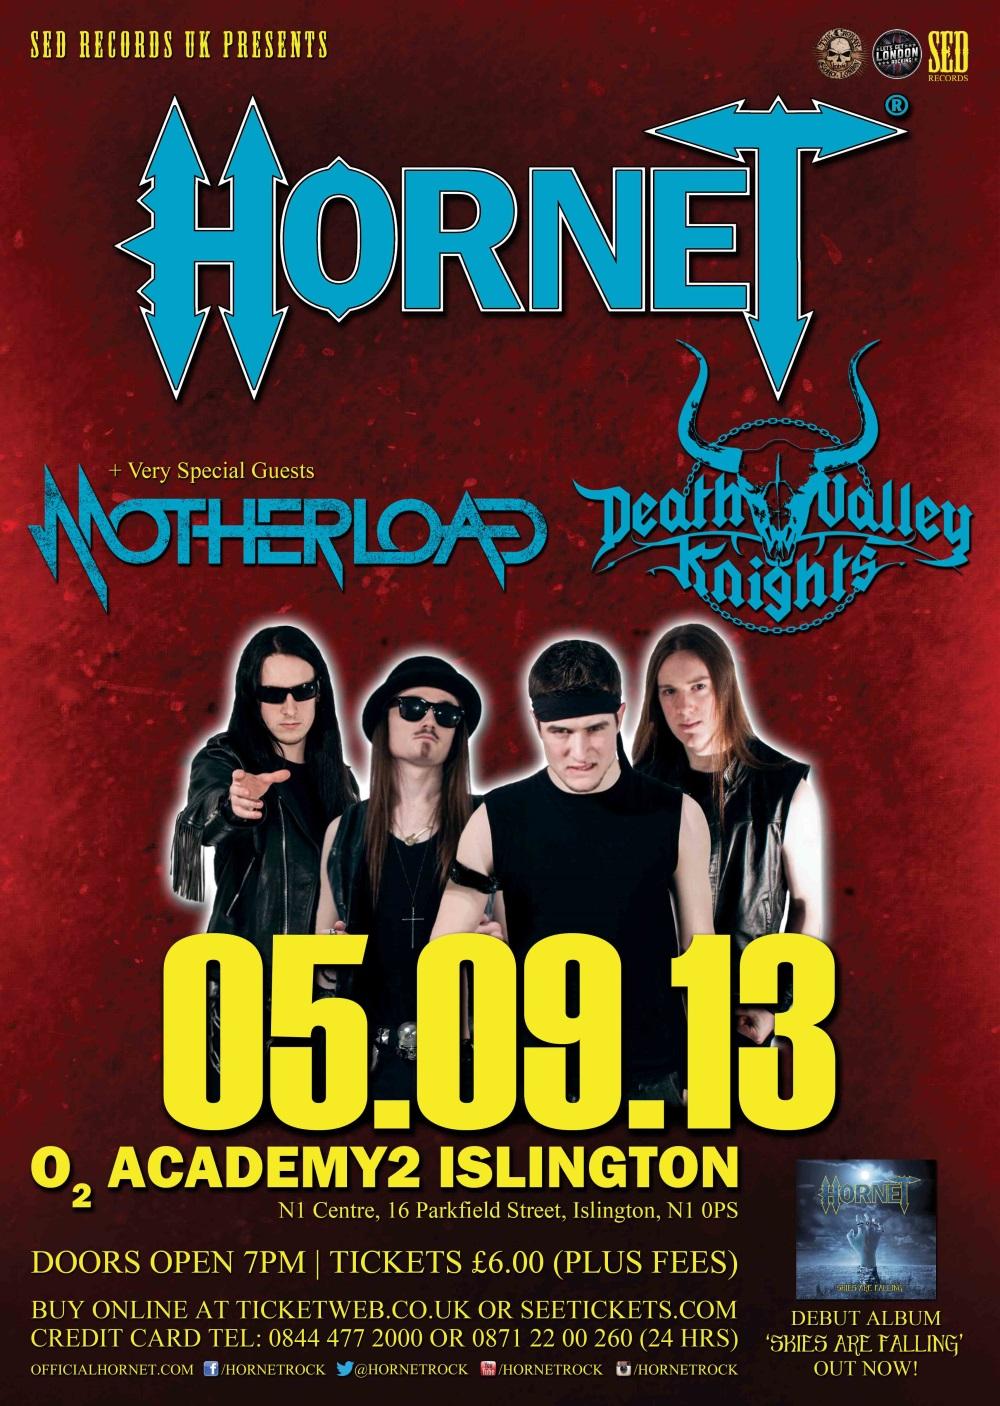 Hornet, Motherload & Death Valley Knights Live @ O2 Academy Islington, 05/09/13